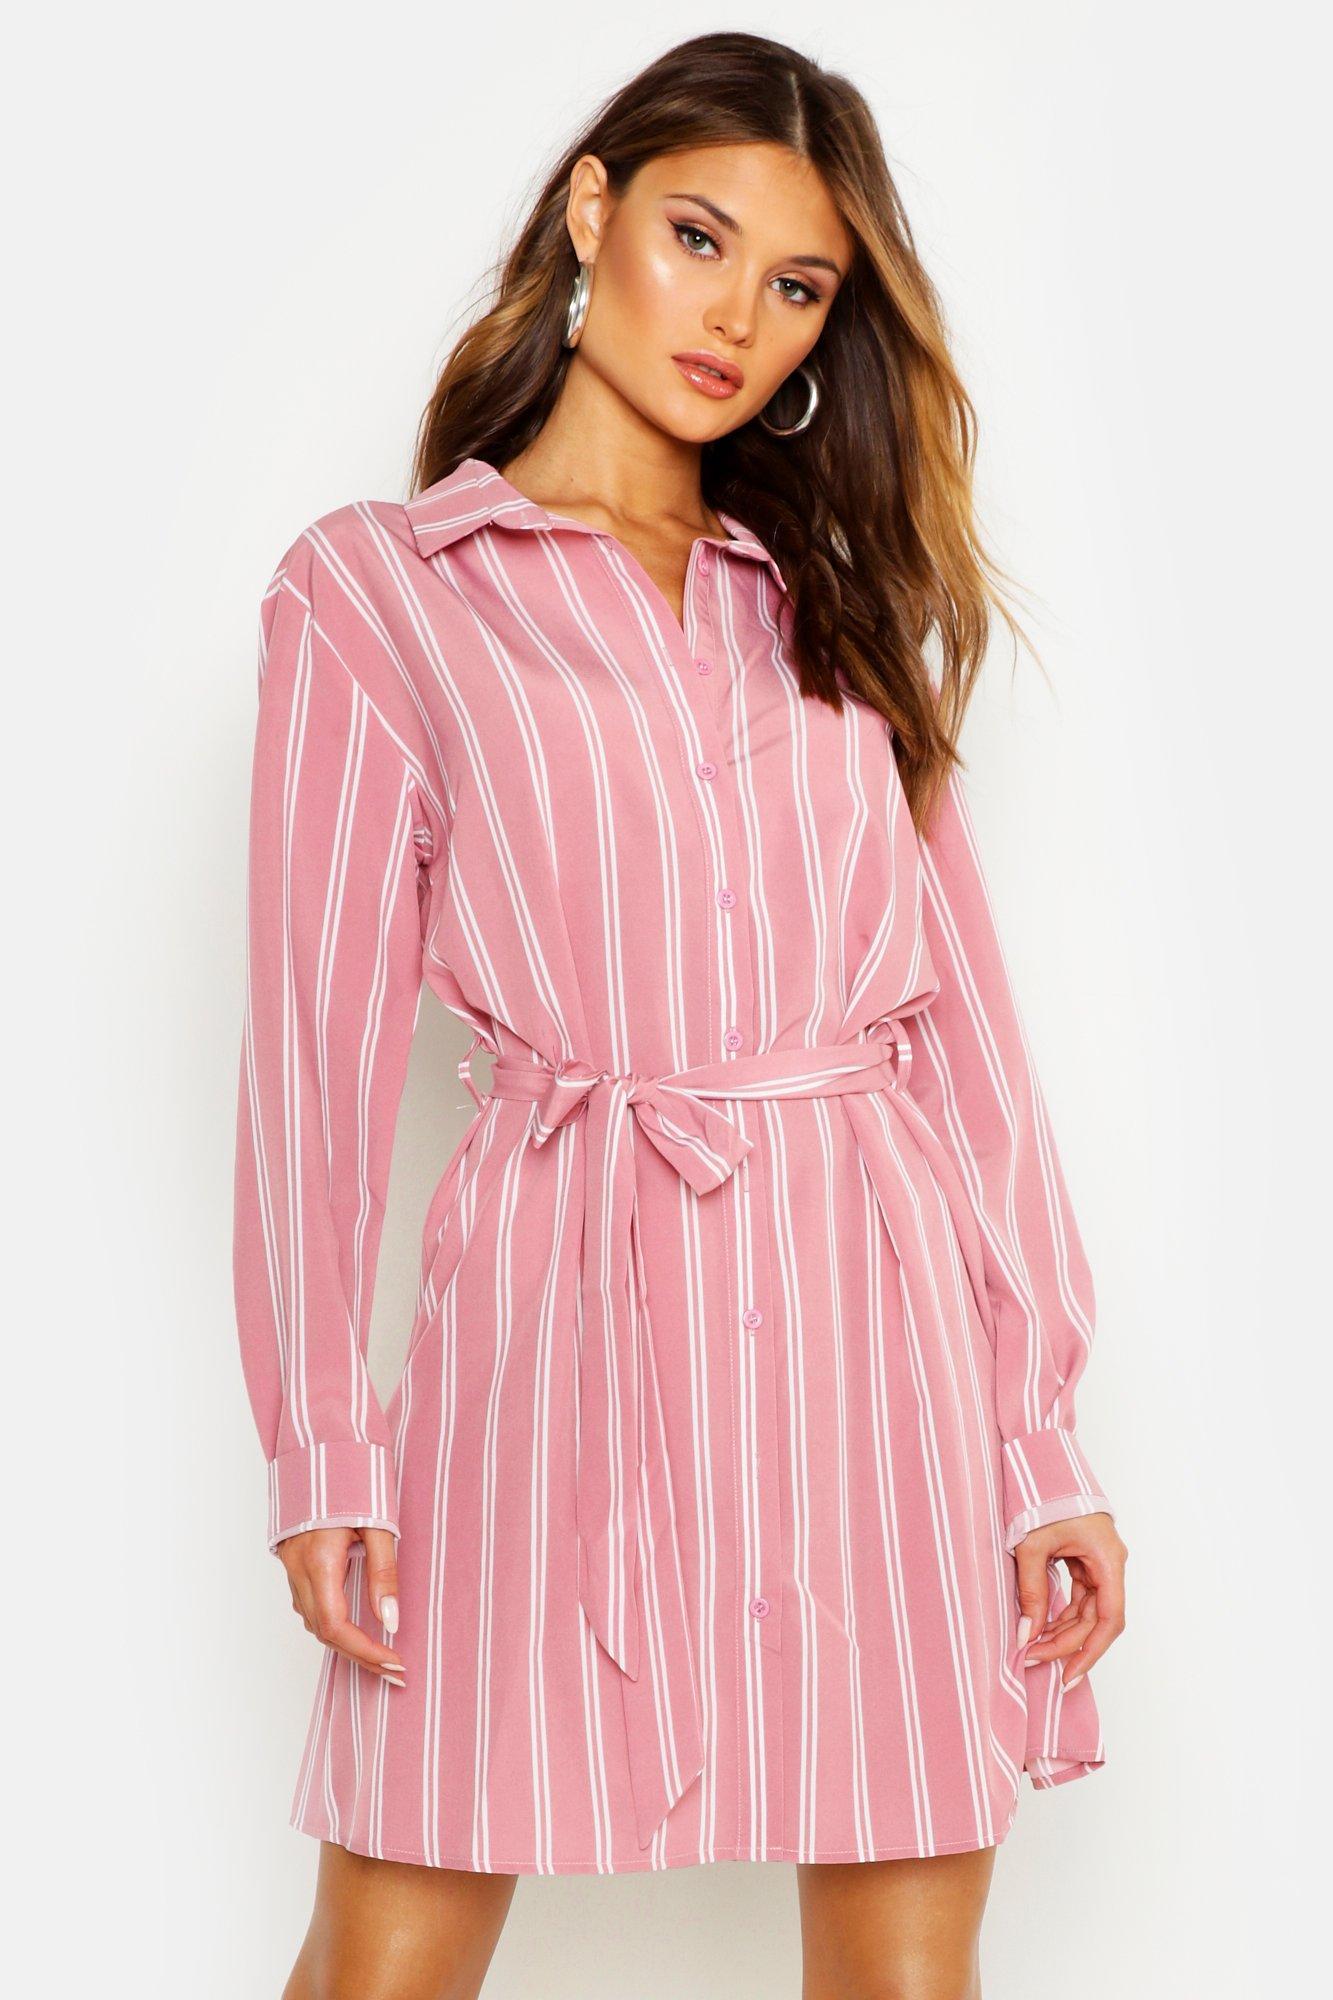 Womens Blusenkleid mit Streifen-Print - Blassrosa - 34, Blassrosa - Boohoo.com